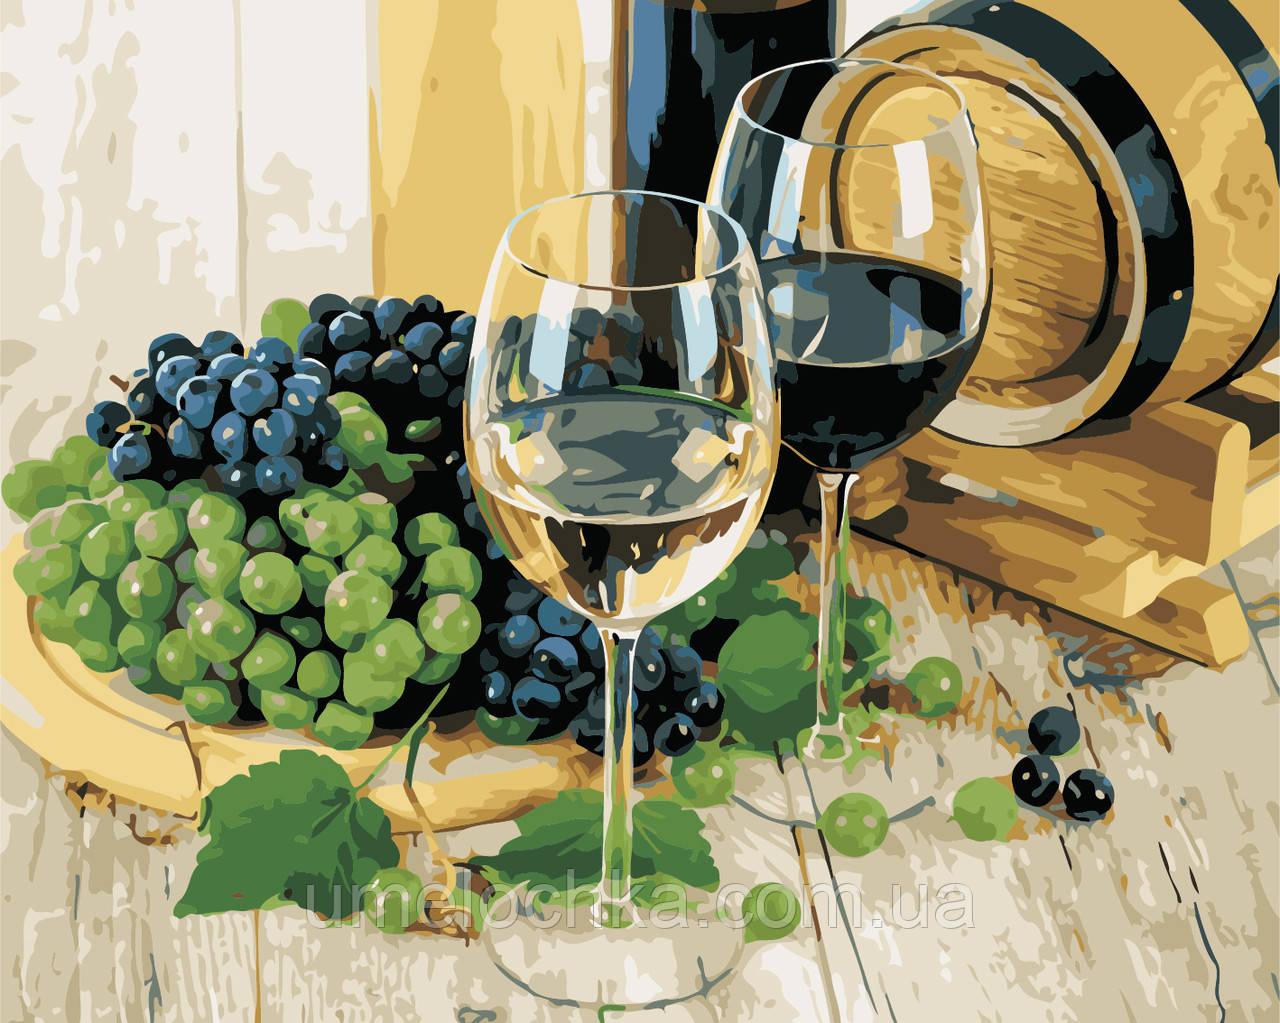 Картина по номерам Виноделие (AS0463) 40 х 50 см ArtStory